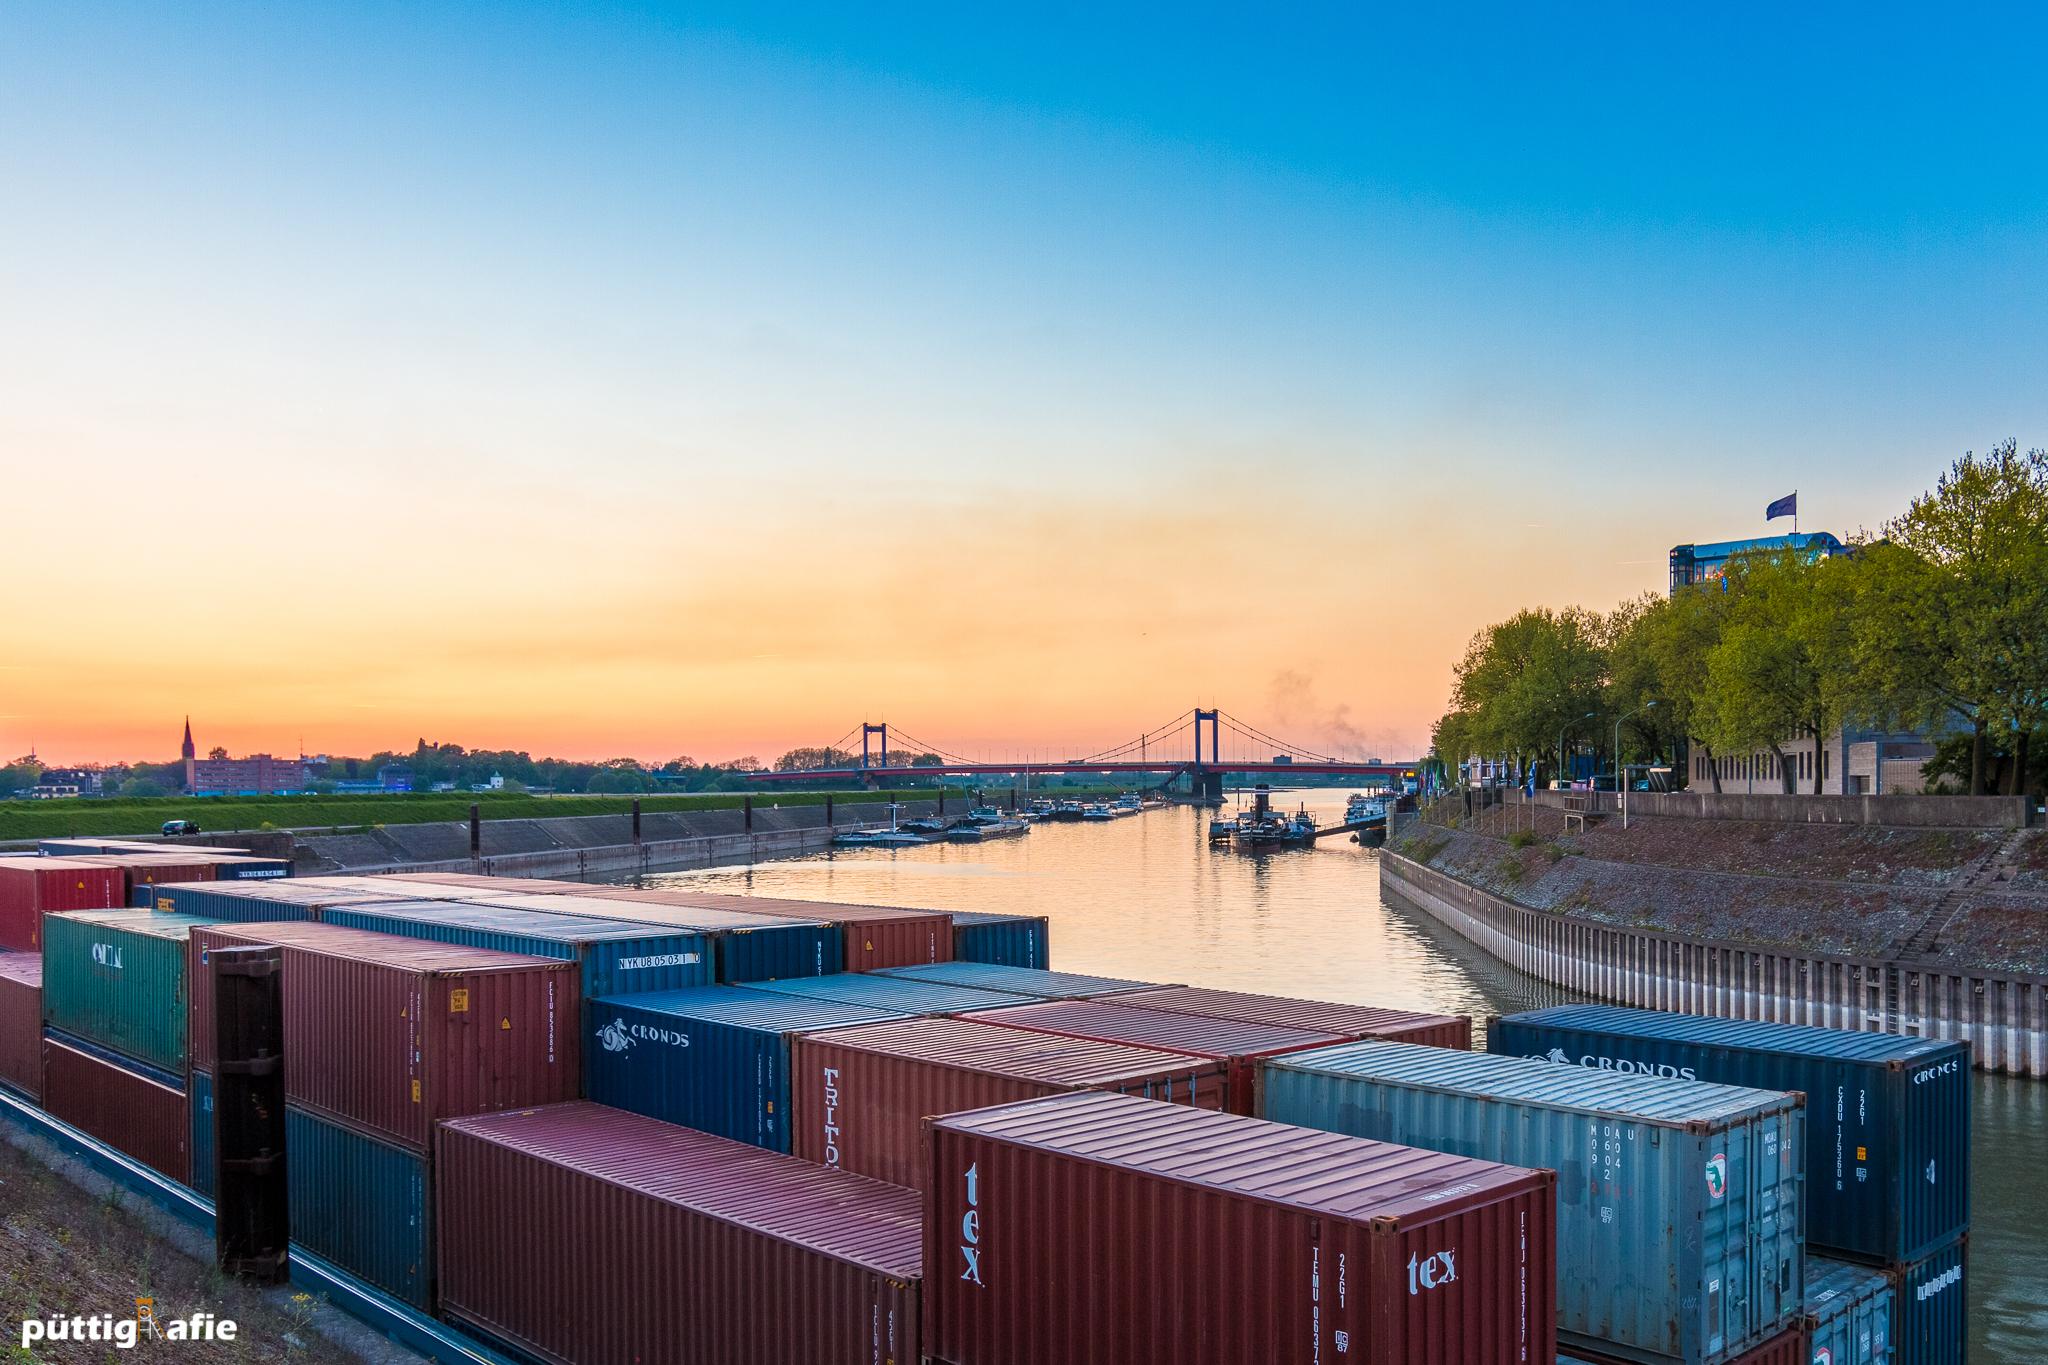 Hafen Duisburg, Germany